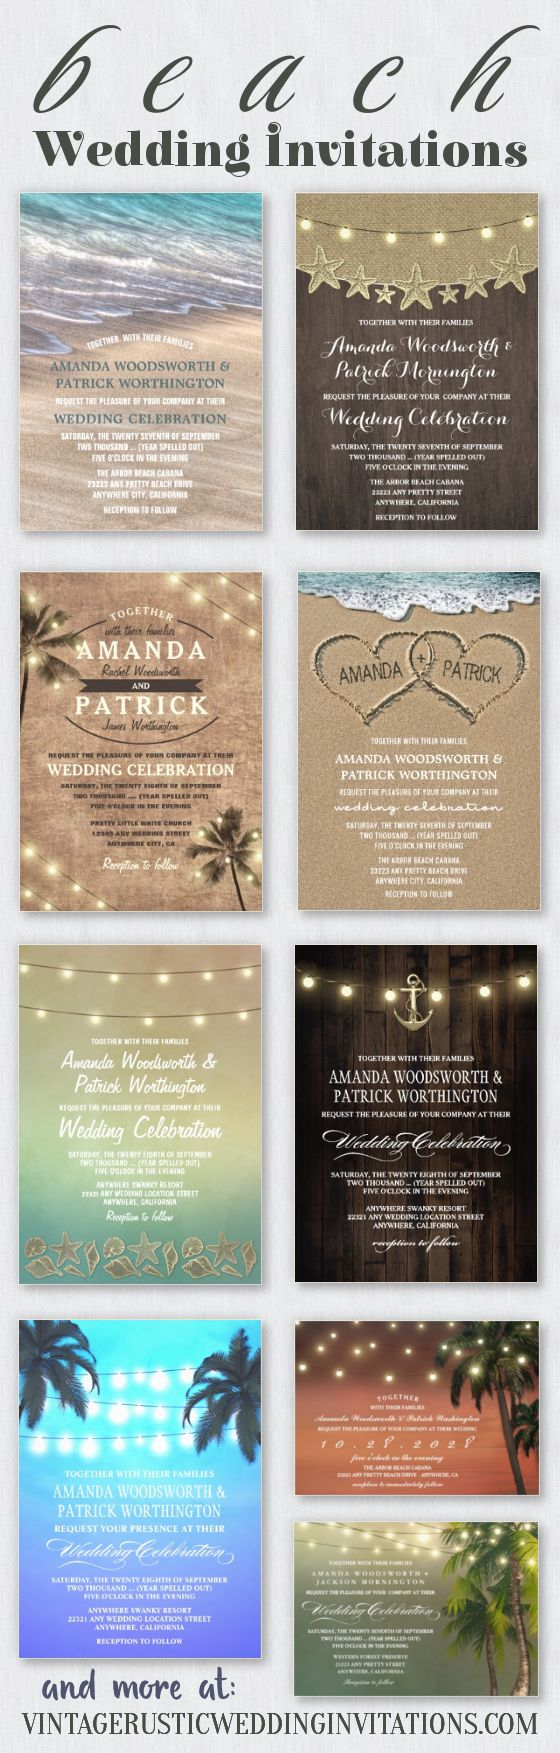 beach wedding invitations features palm tree